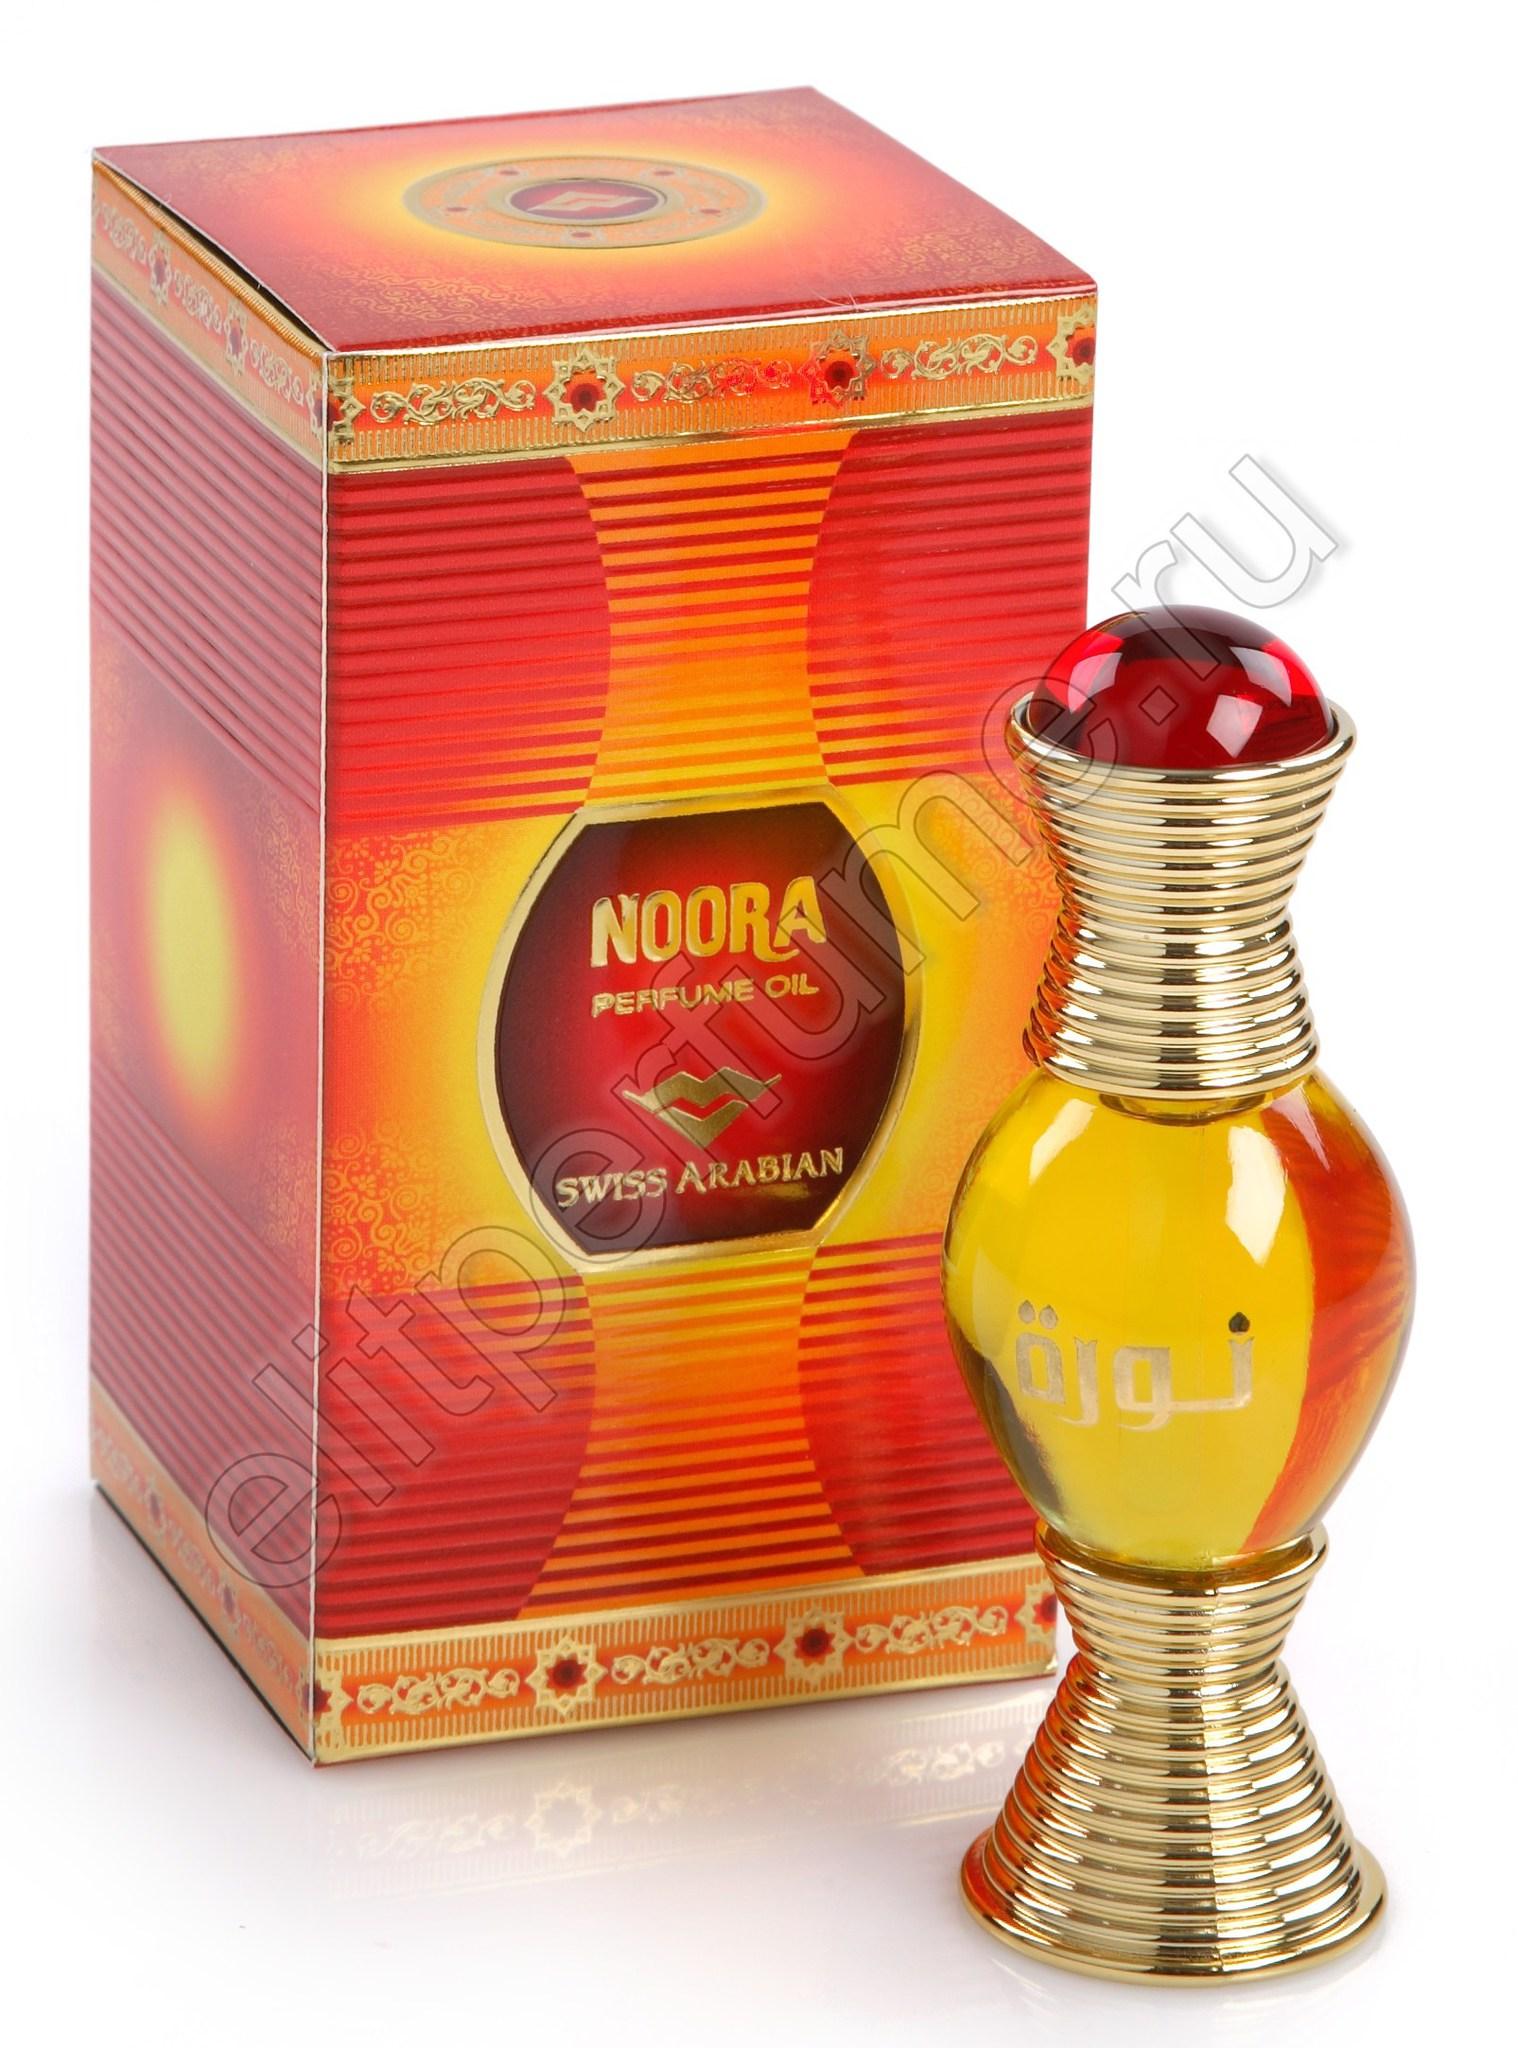 Нура Свисс Арабиан Noora Swiss Arabian)20 мл арабские масляные духи от Свисс Арабиан Swiss Arabian